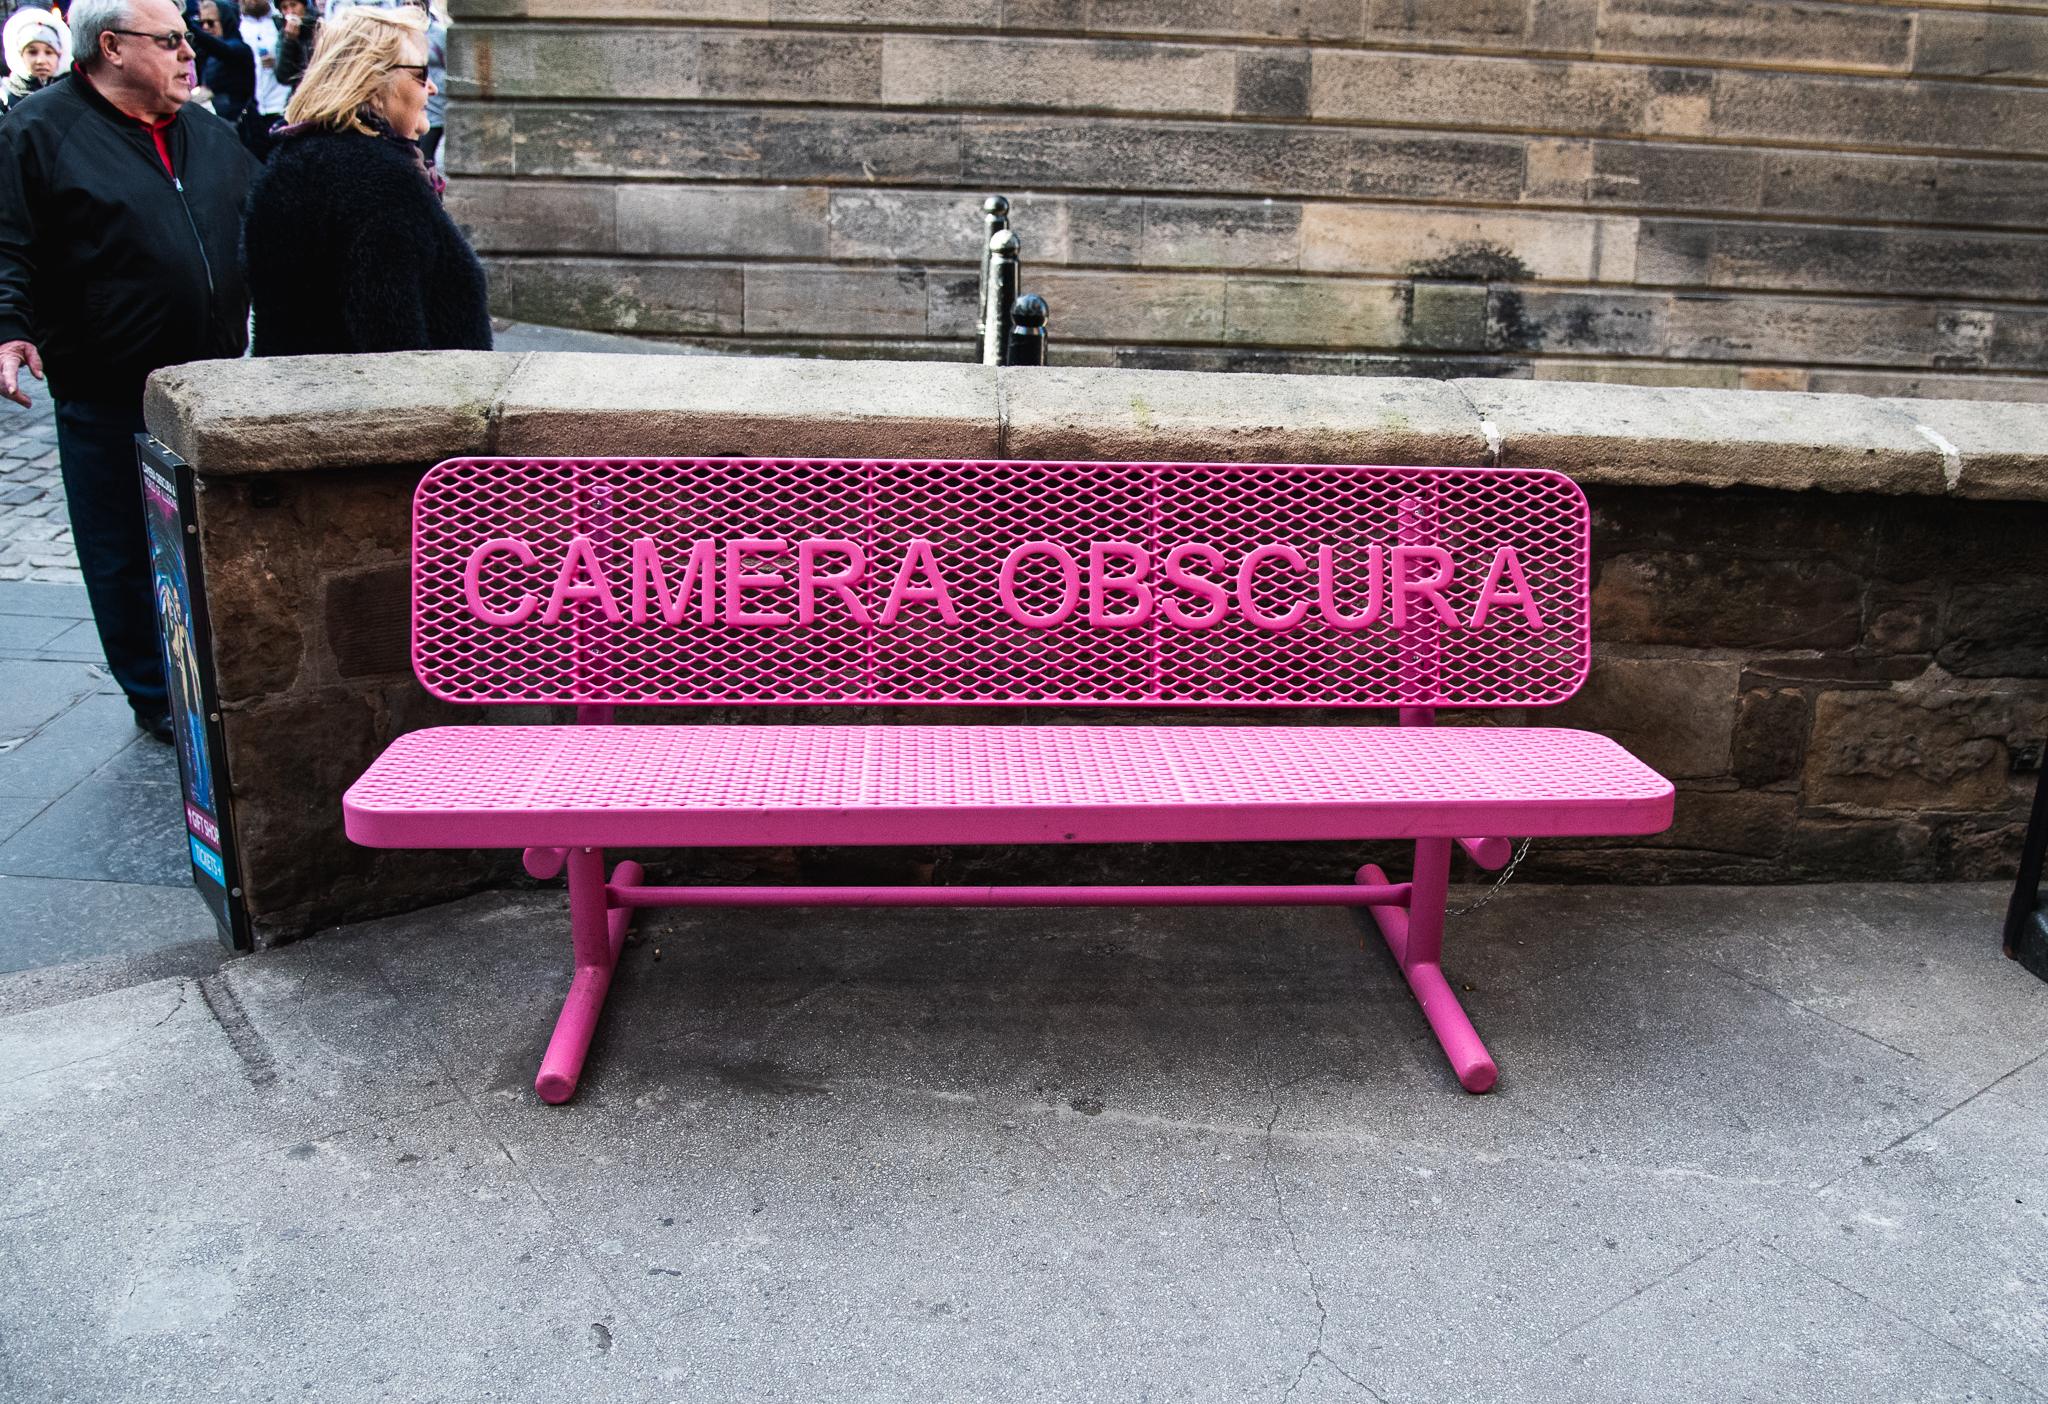 camera obscura, museum, edinburgh, illusions, scotland, tourist attraction edinburgh, pink bench